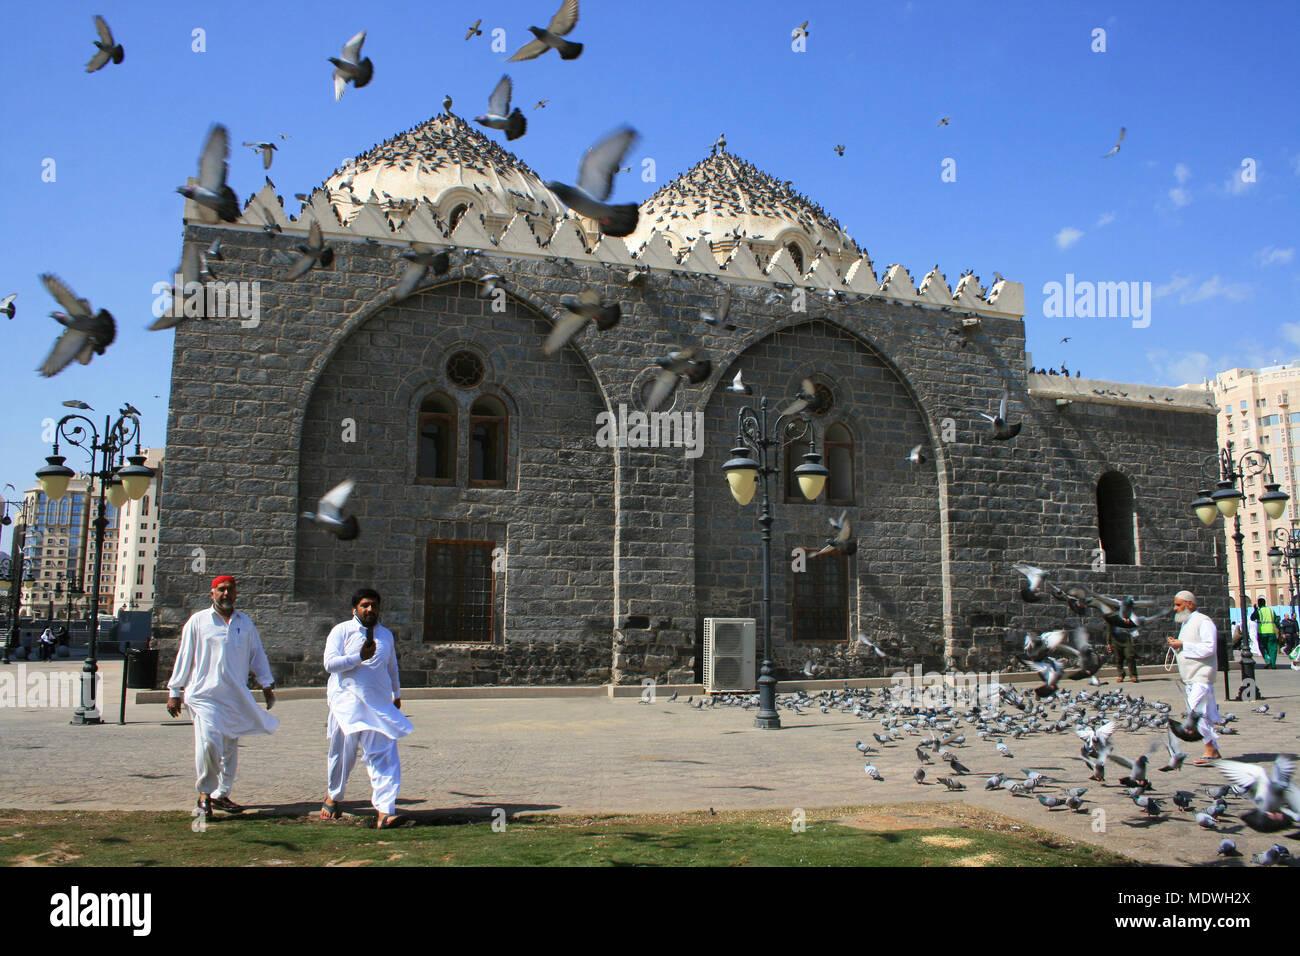 ghamama mosque in medina saudi arabia stock photo 180656418 alamy